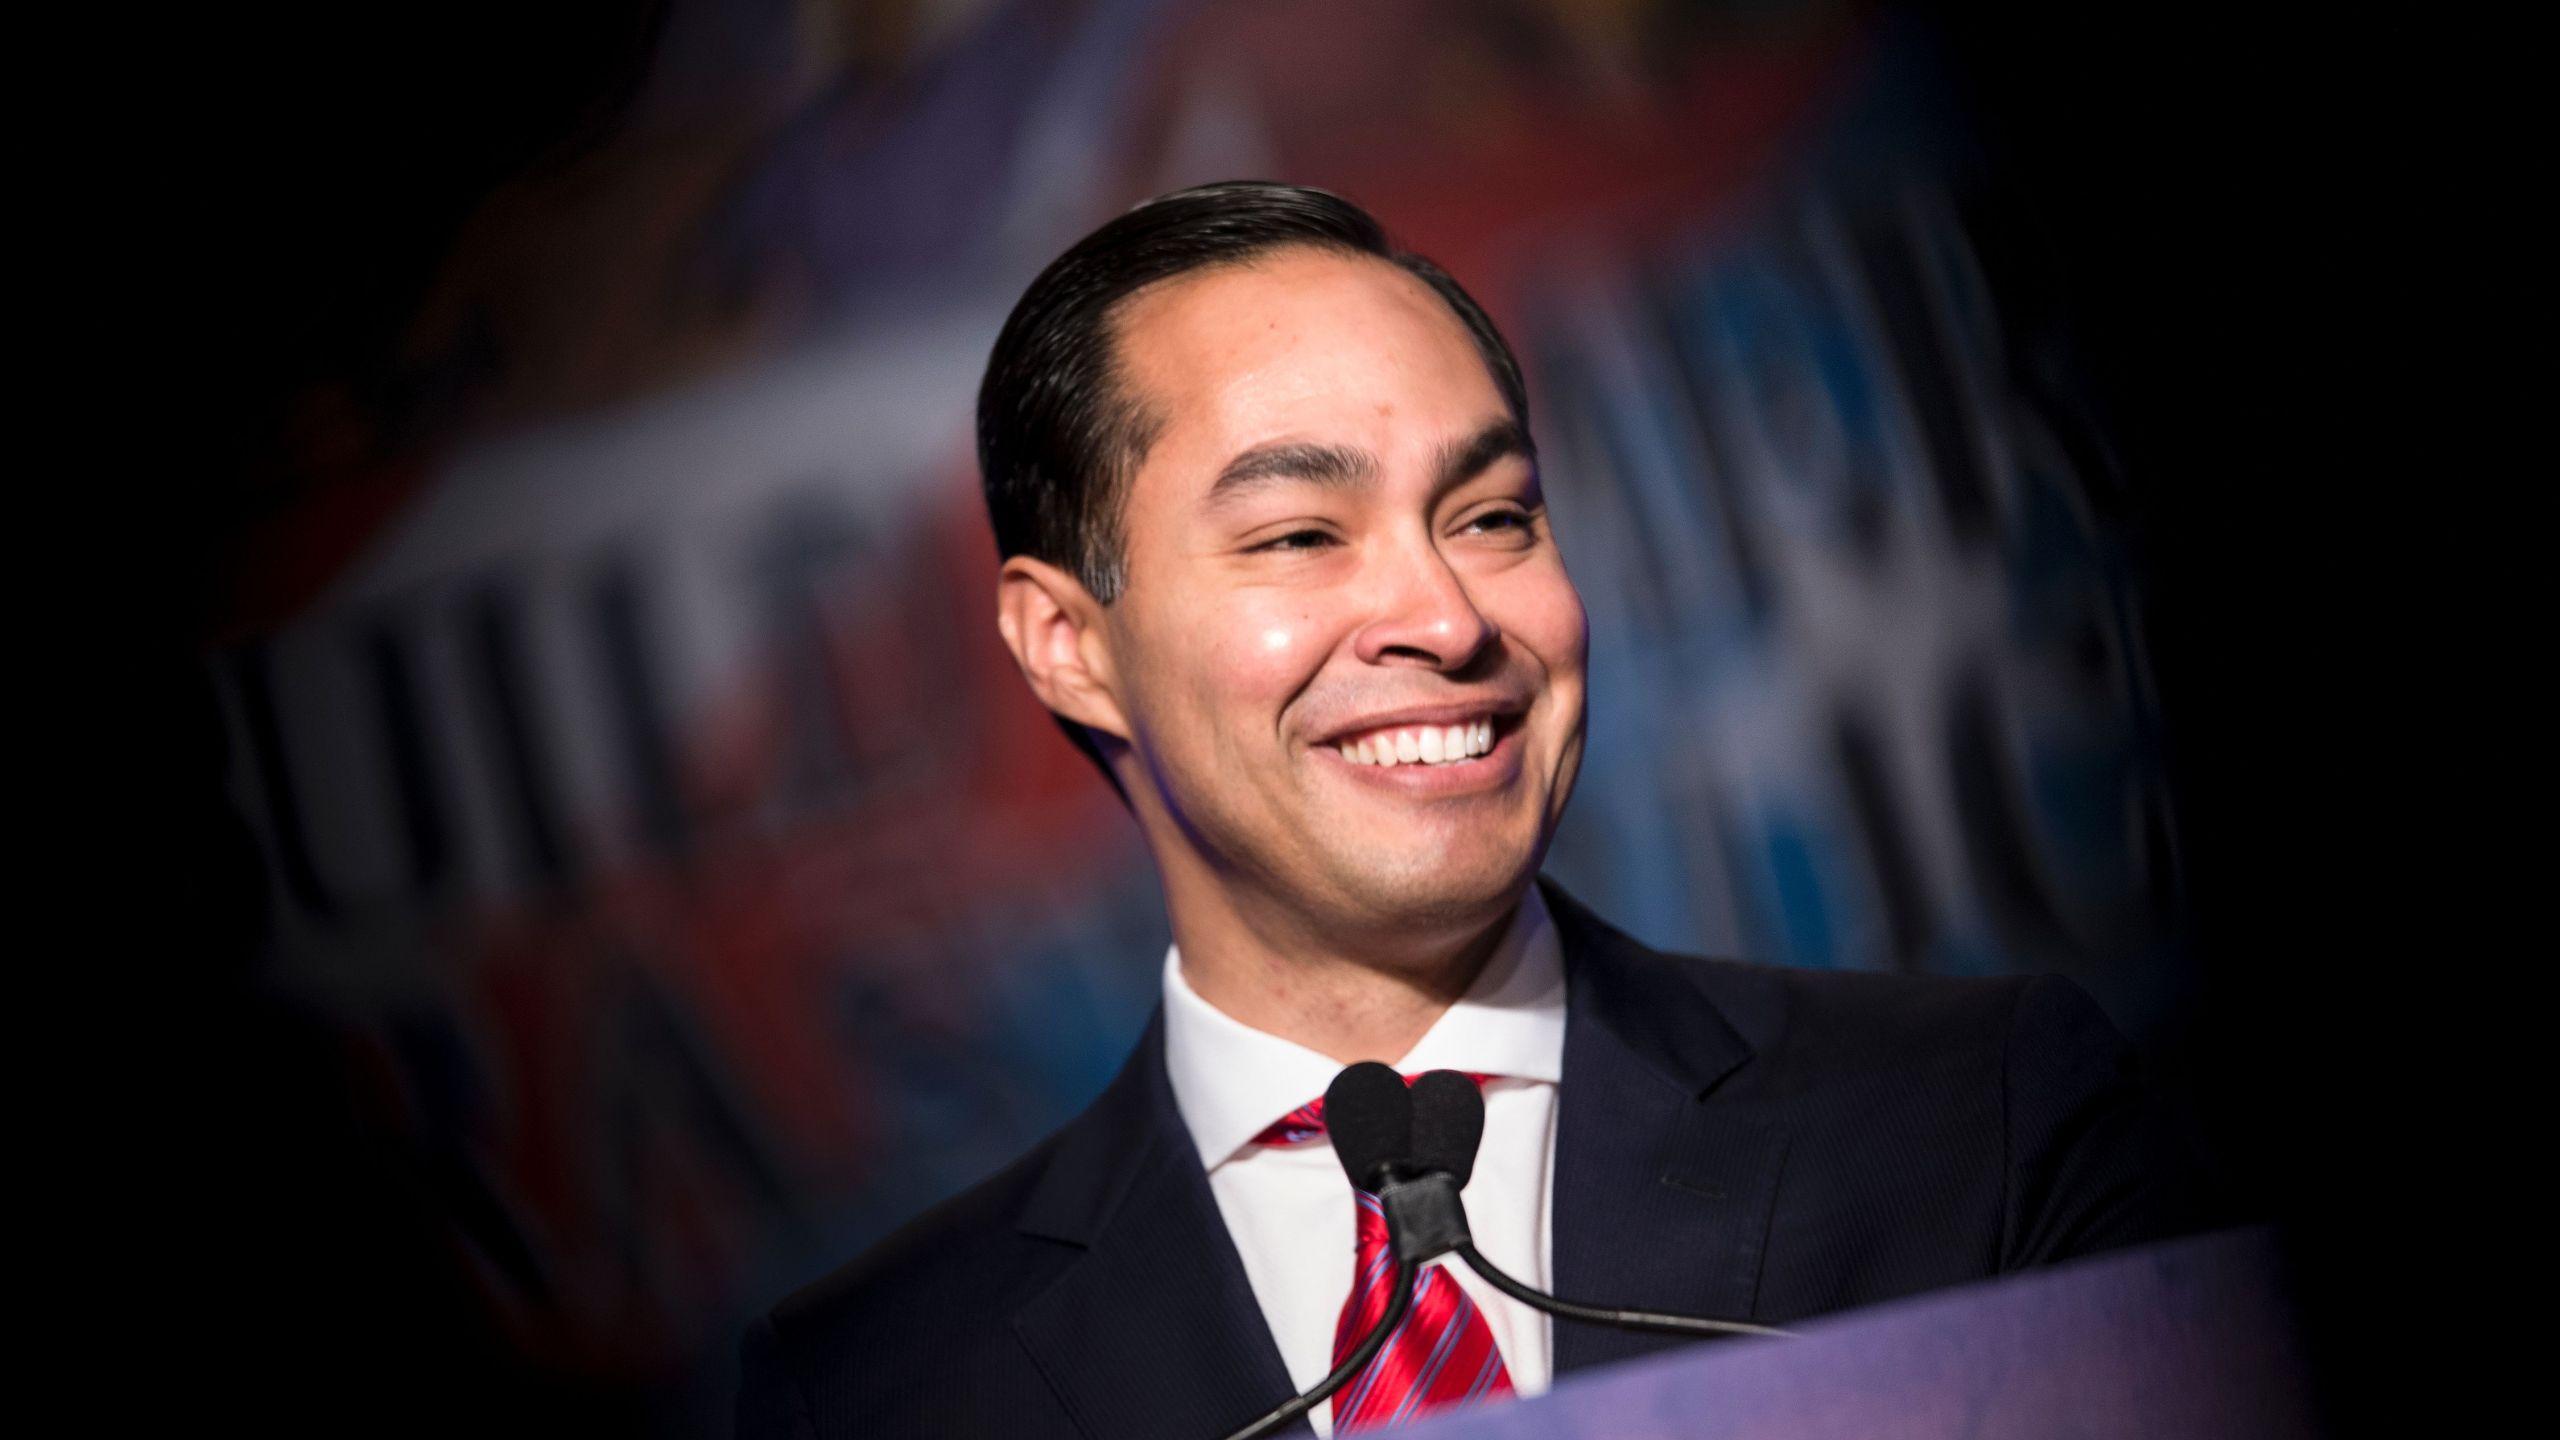 Julian Castro addresses the North American Building Trades Union National Legislative Conference on April 19, 2016 in Washington, D.C. (Credit: BRENDAN SMIALOWSKI/AFP/Getty Images)